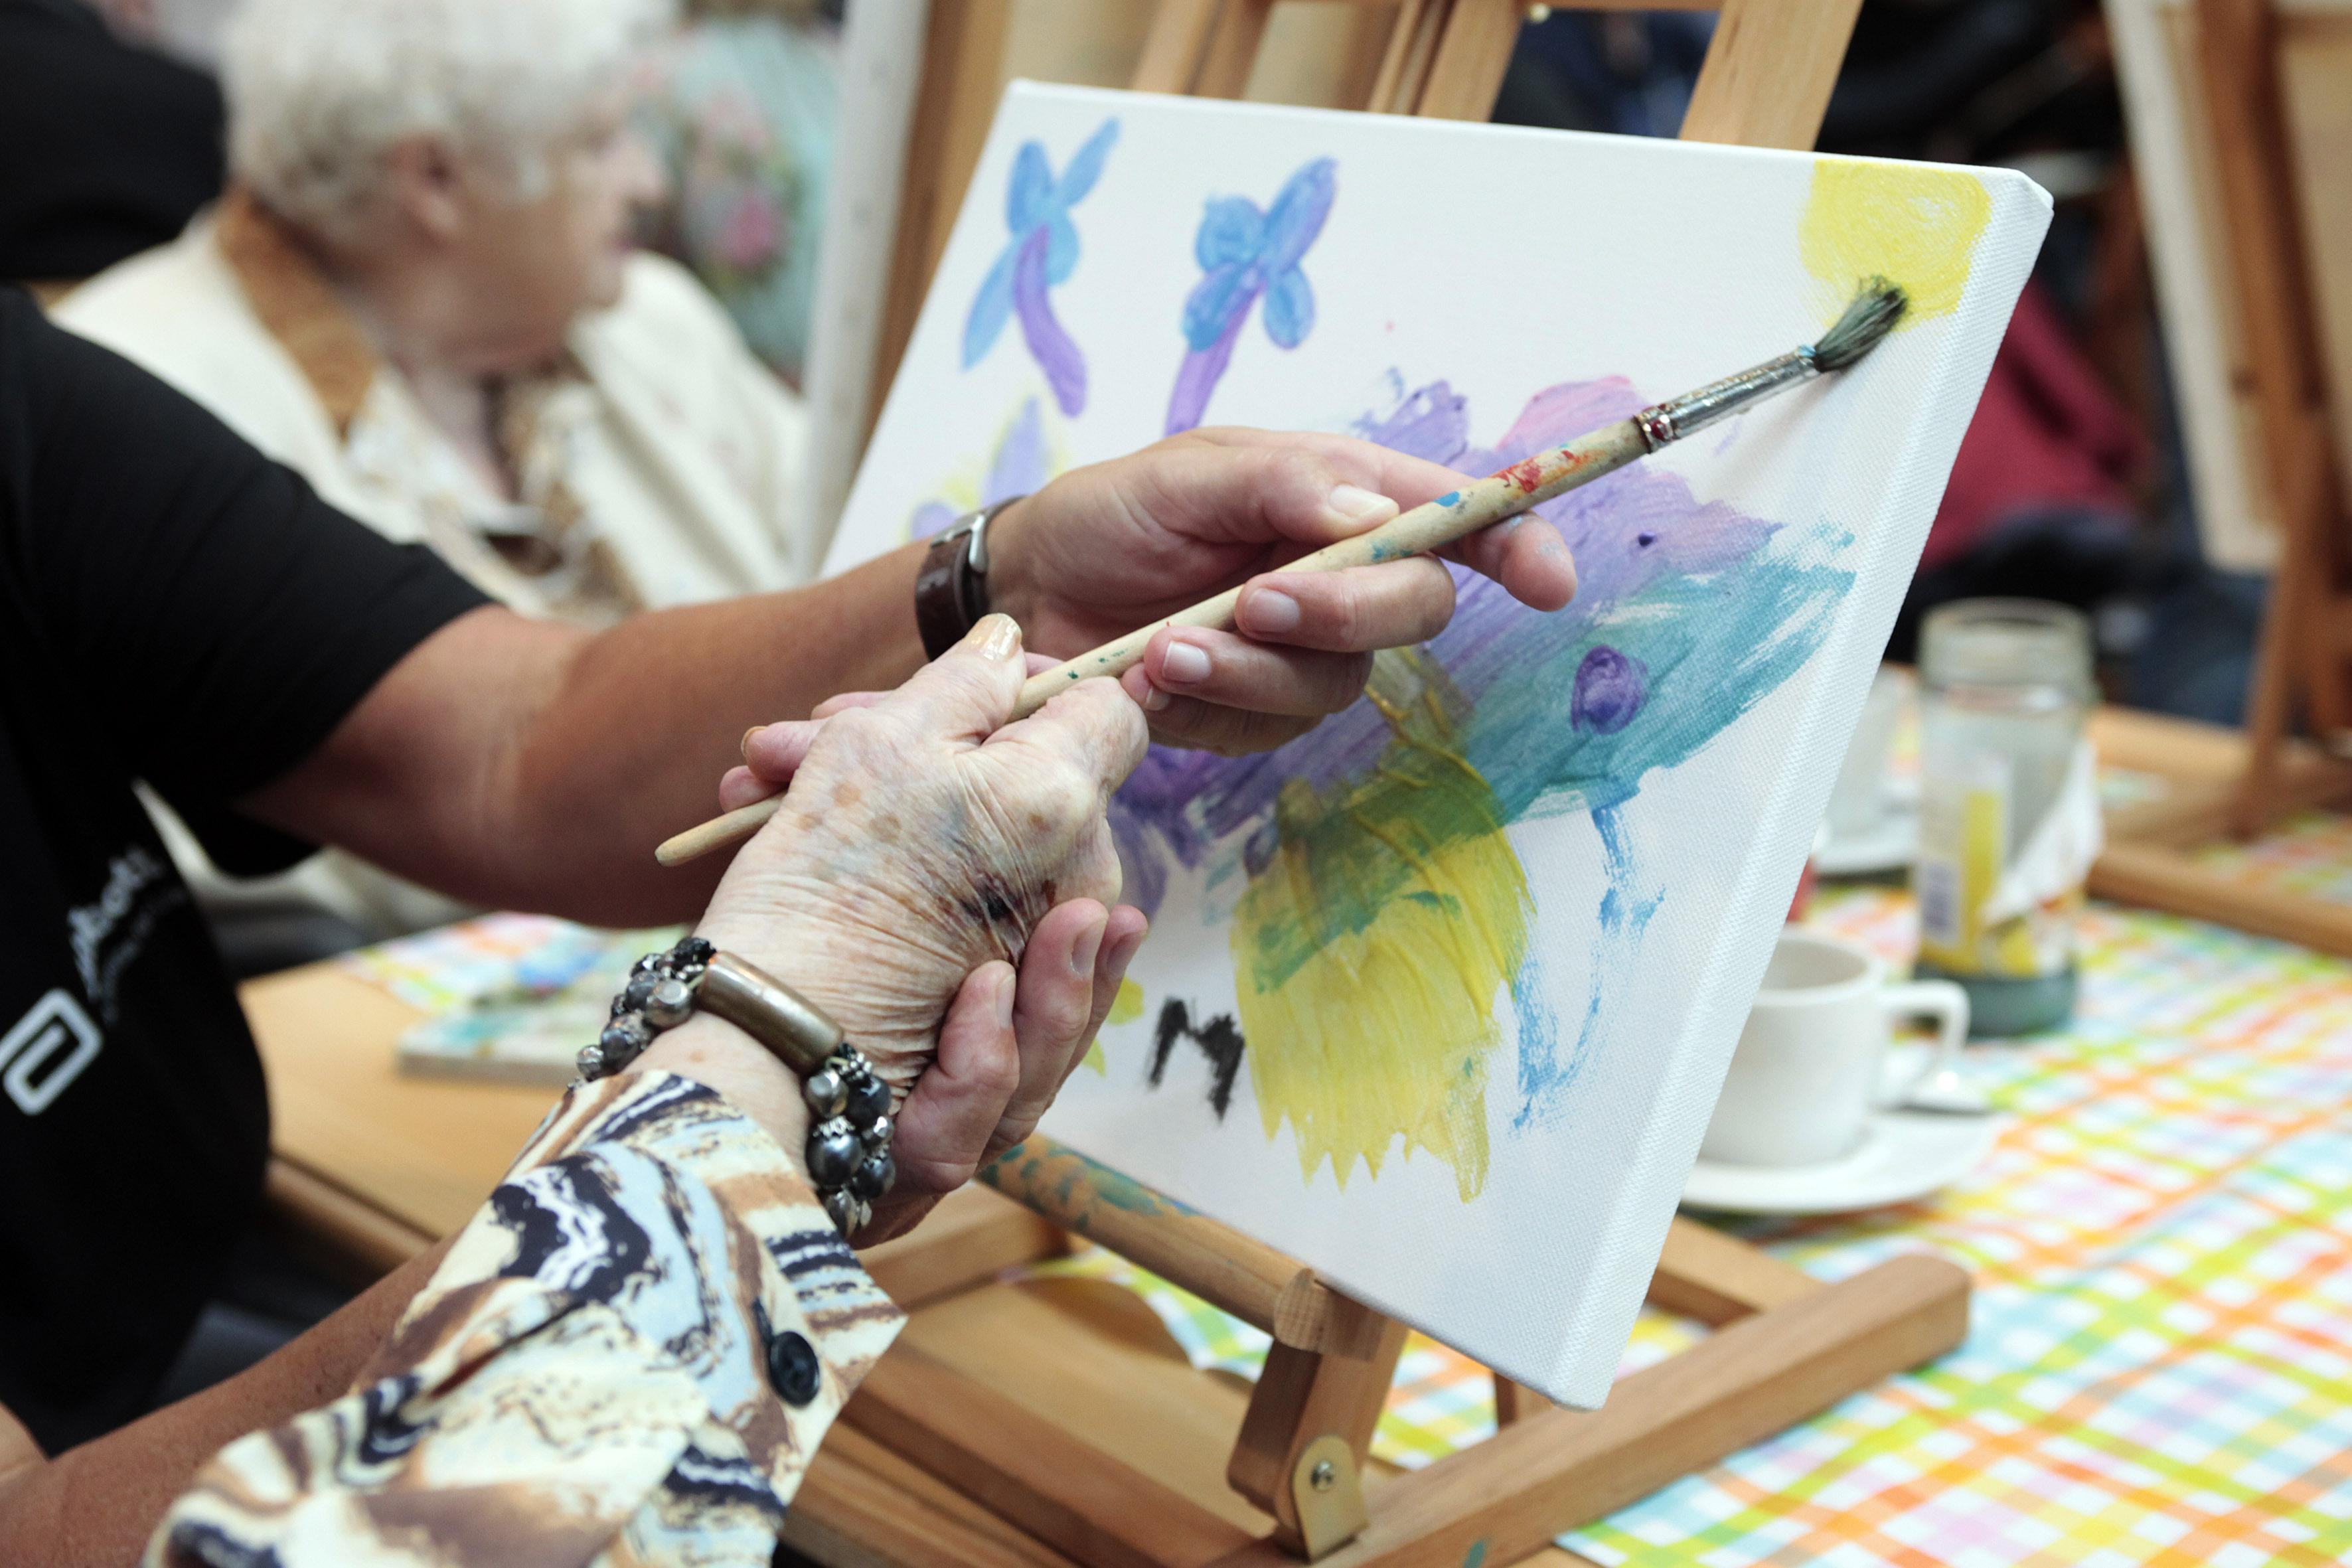 Gooise afdeling Alzheimer Nederland bezorgd over wegvallen dagbesteding: 'Zeer zorgelijke ontwikkeling; het gaat wel over kwetsbare mensen'